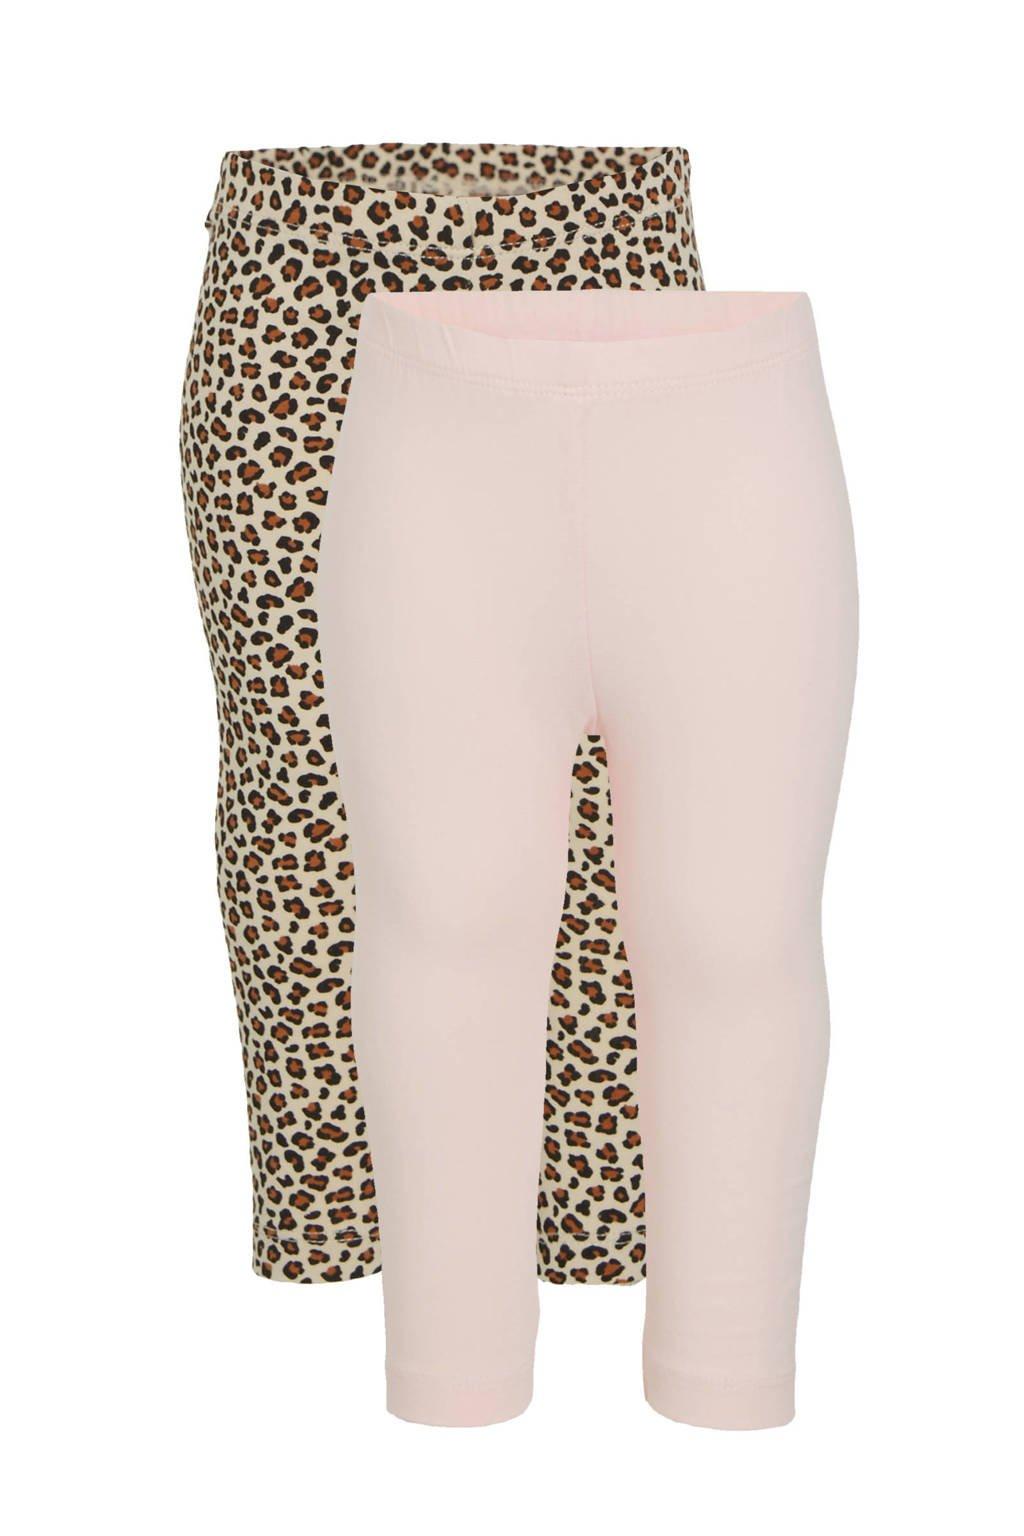 Ellos baby legging Ambe met all over print roze-lichtbruin/zwart - (set van 2), Roze-lichtbruin/zwart